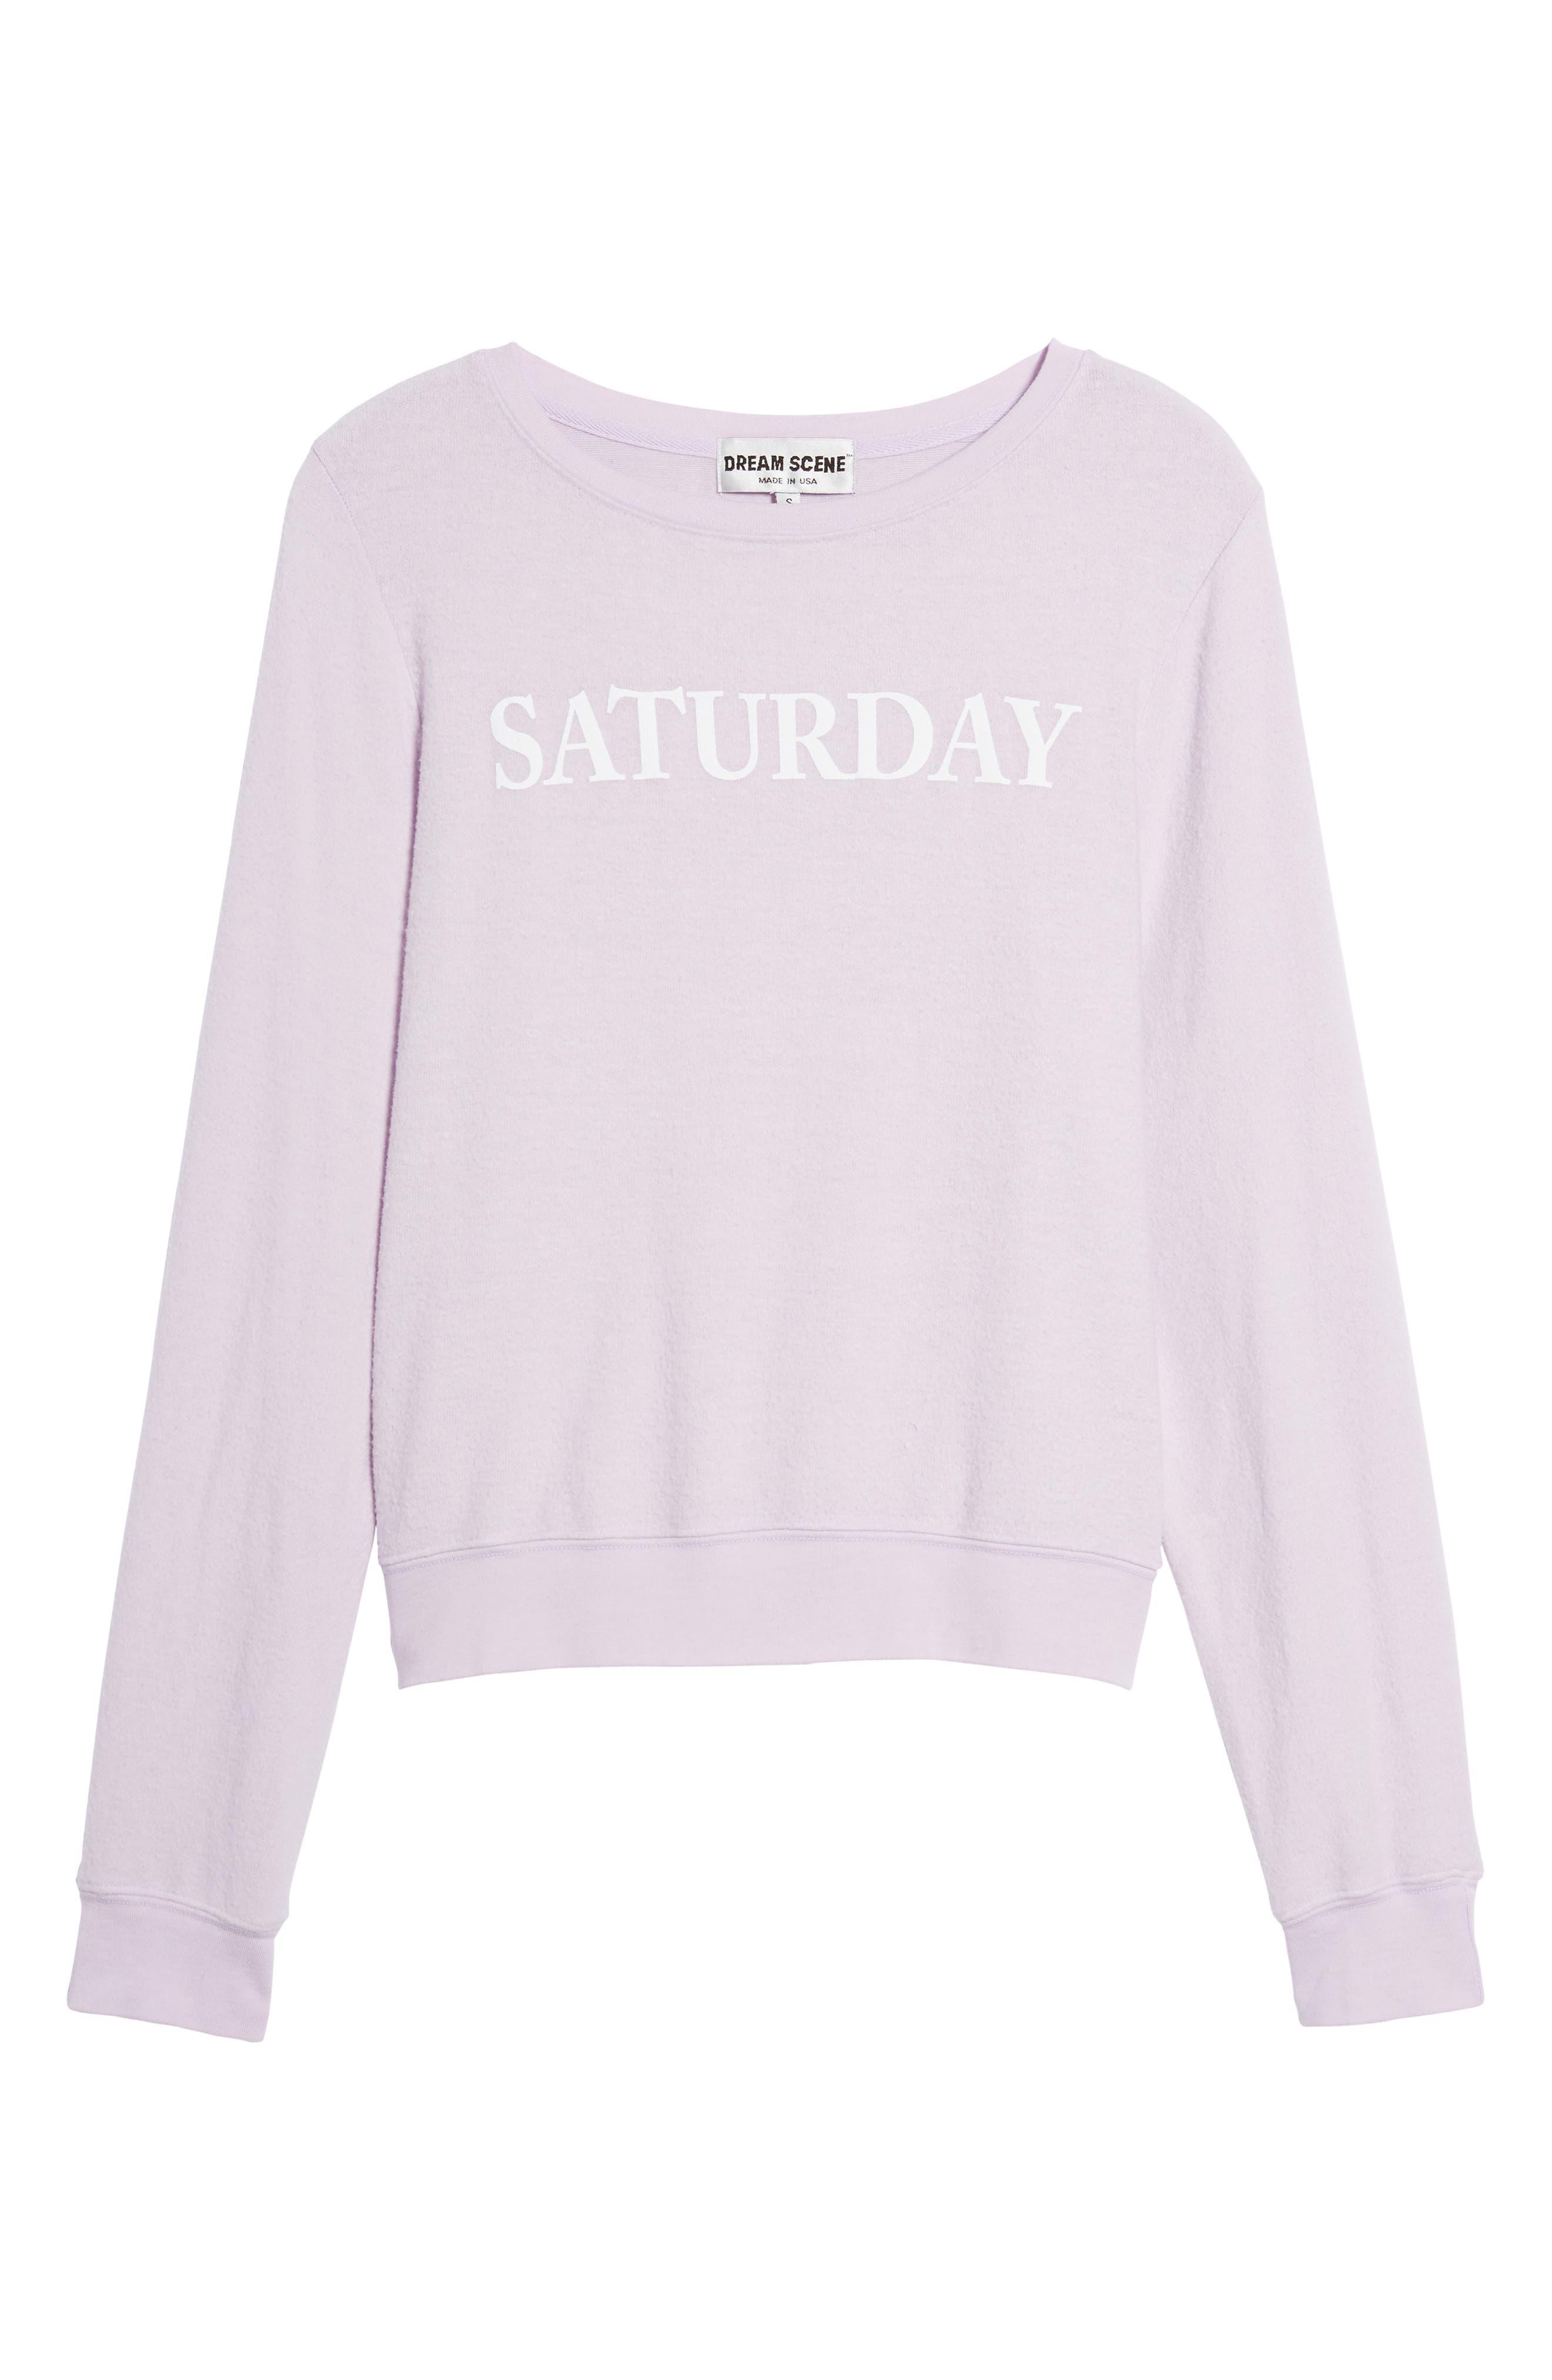 Saturday Sweatshirt,                             Alternate thumbnail 6, color,                             510